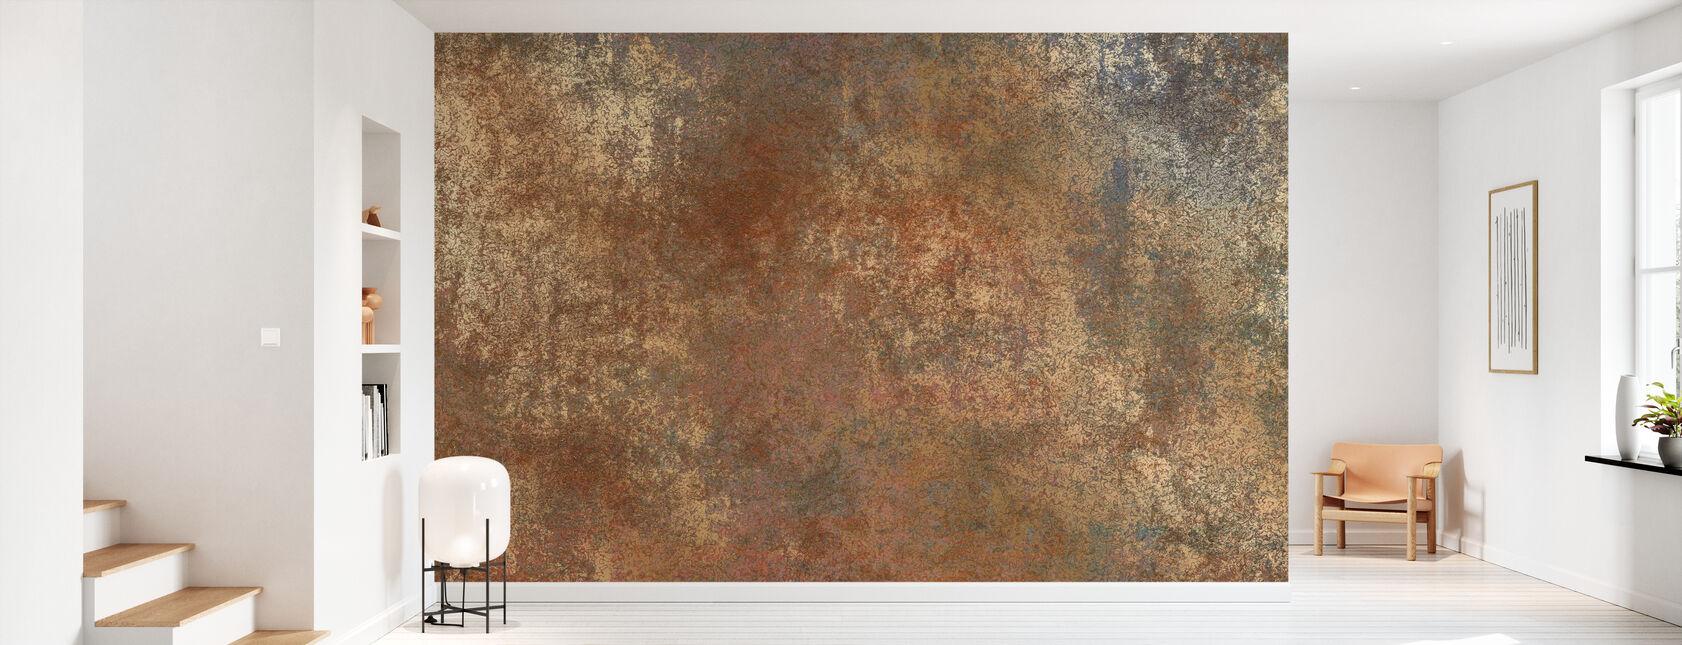 Rust n Gold Wall - Wallpaper - Hallway